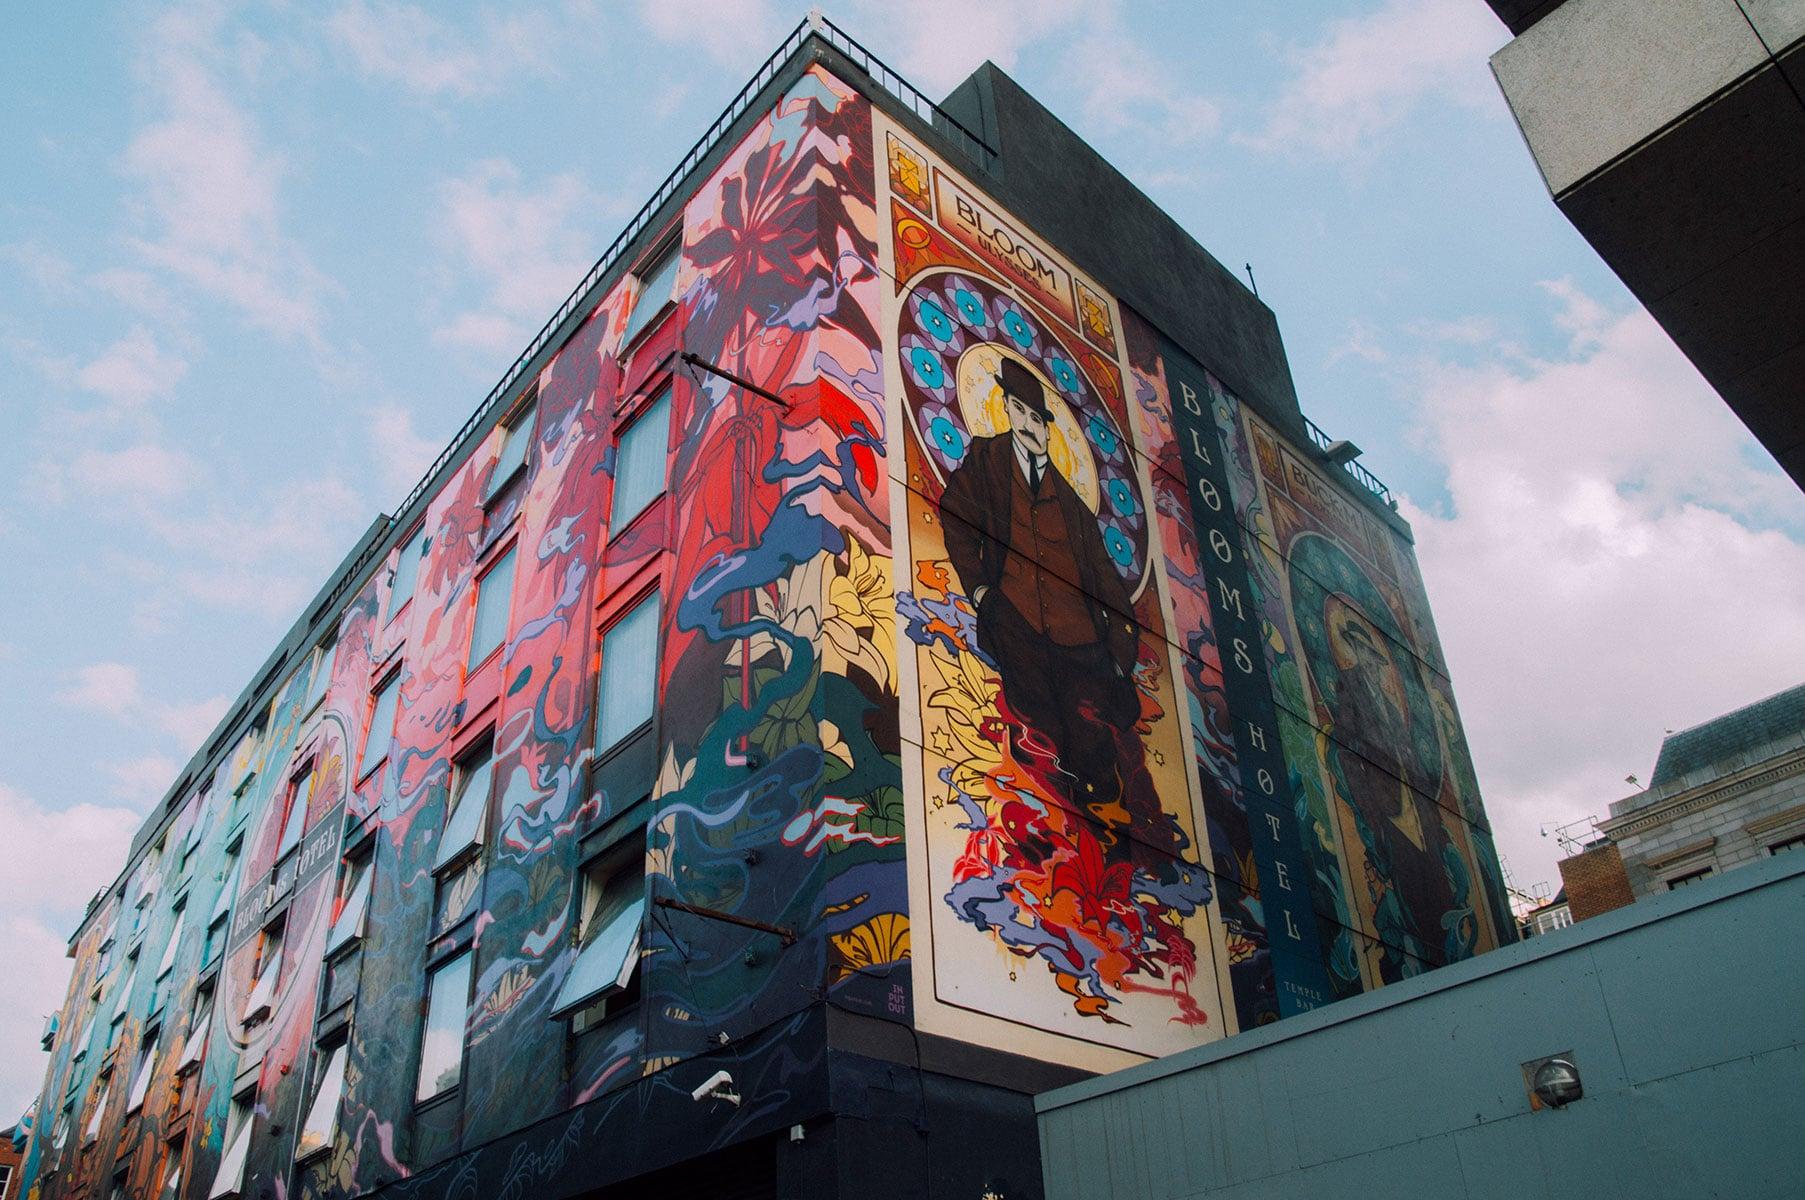 voyage-dublin-temple-bar-street-art